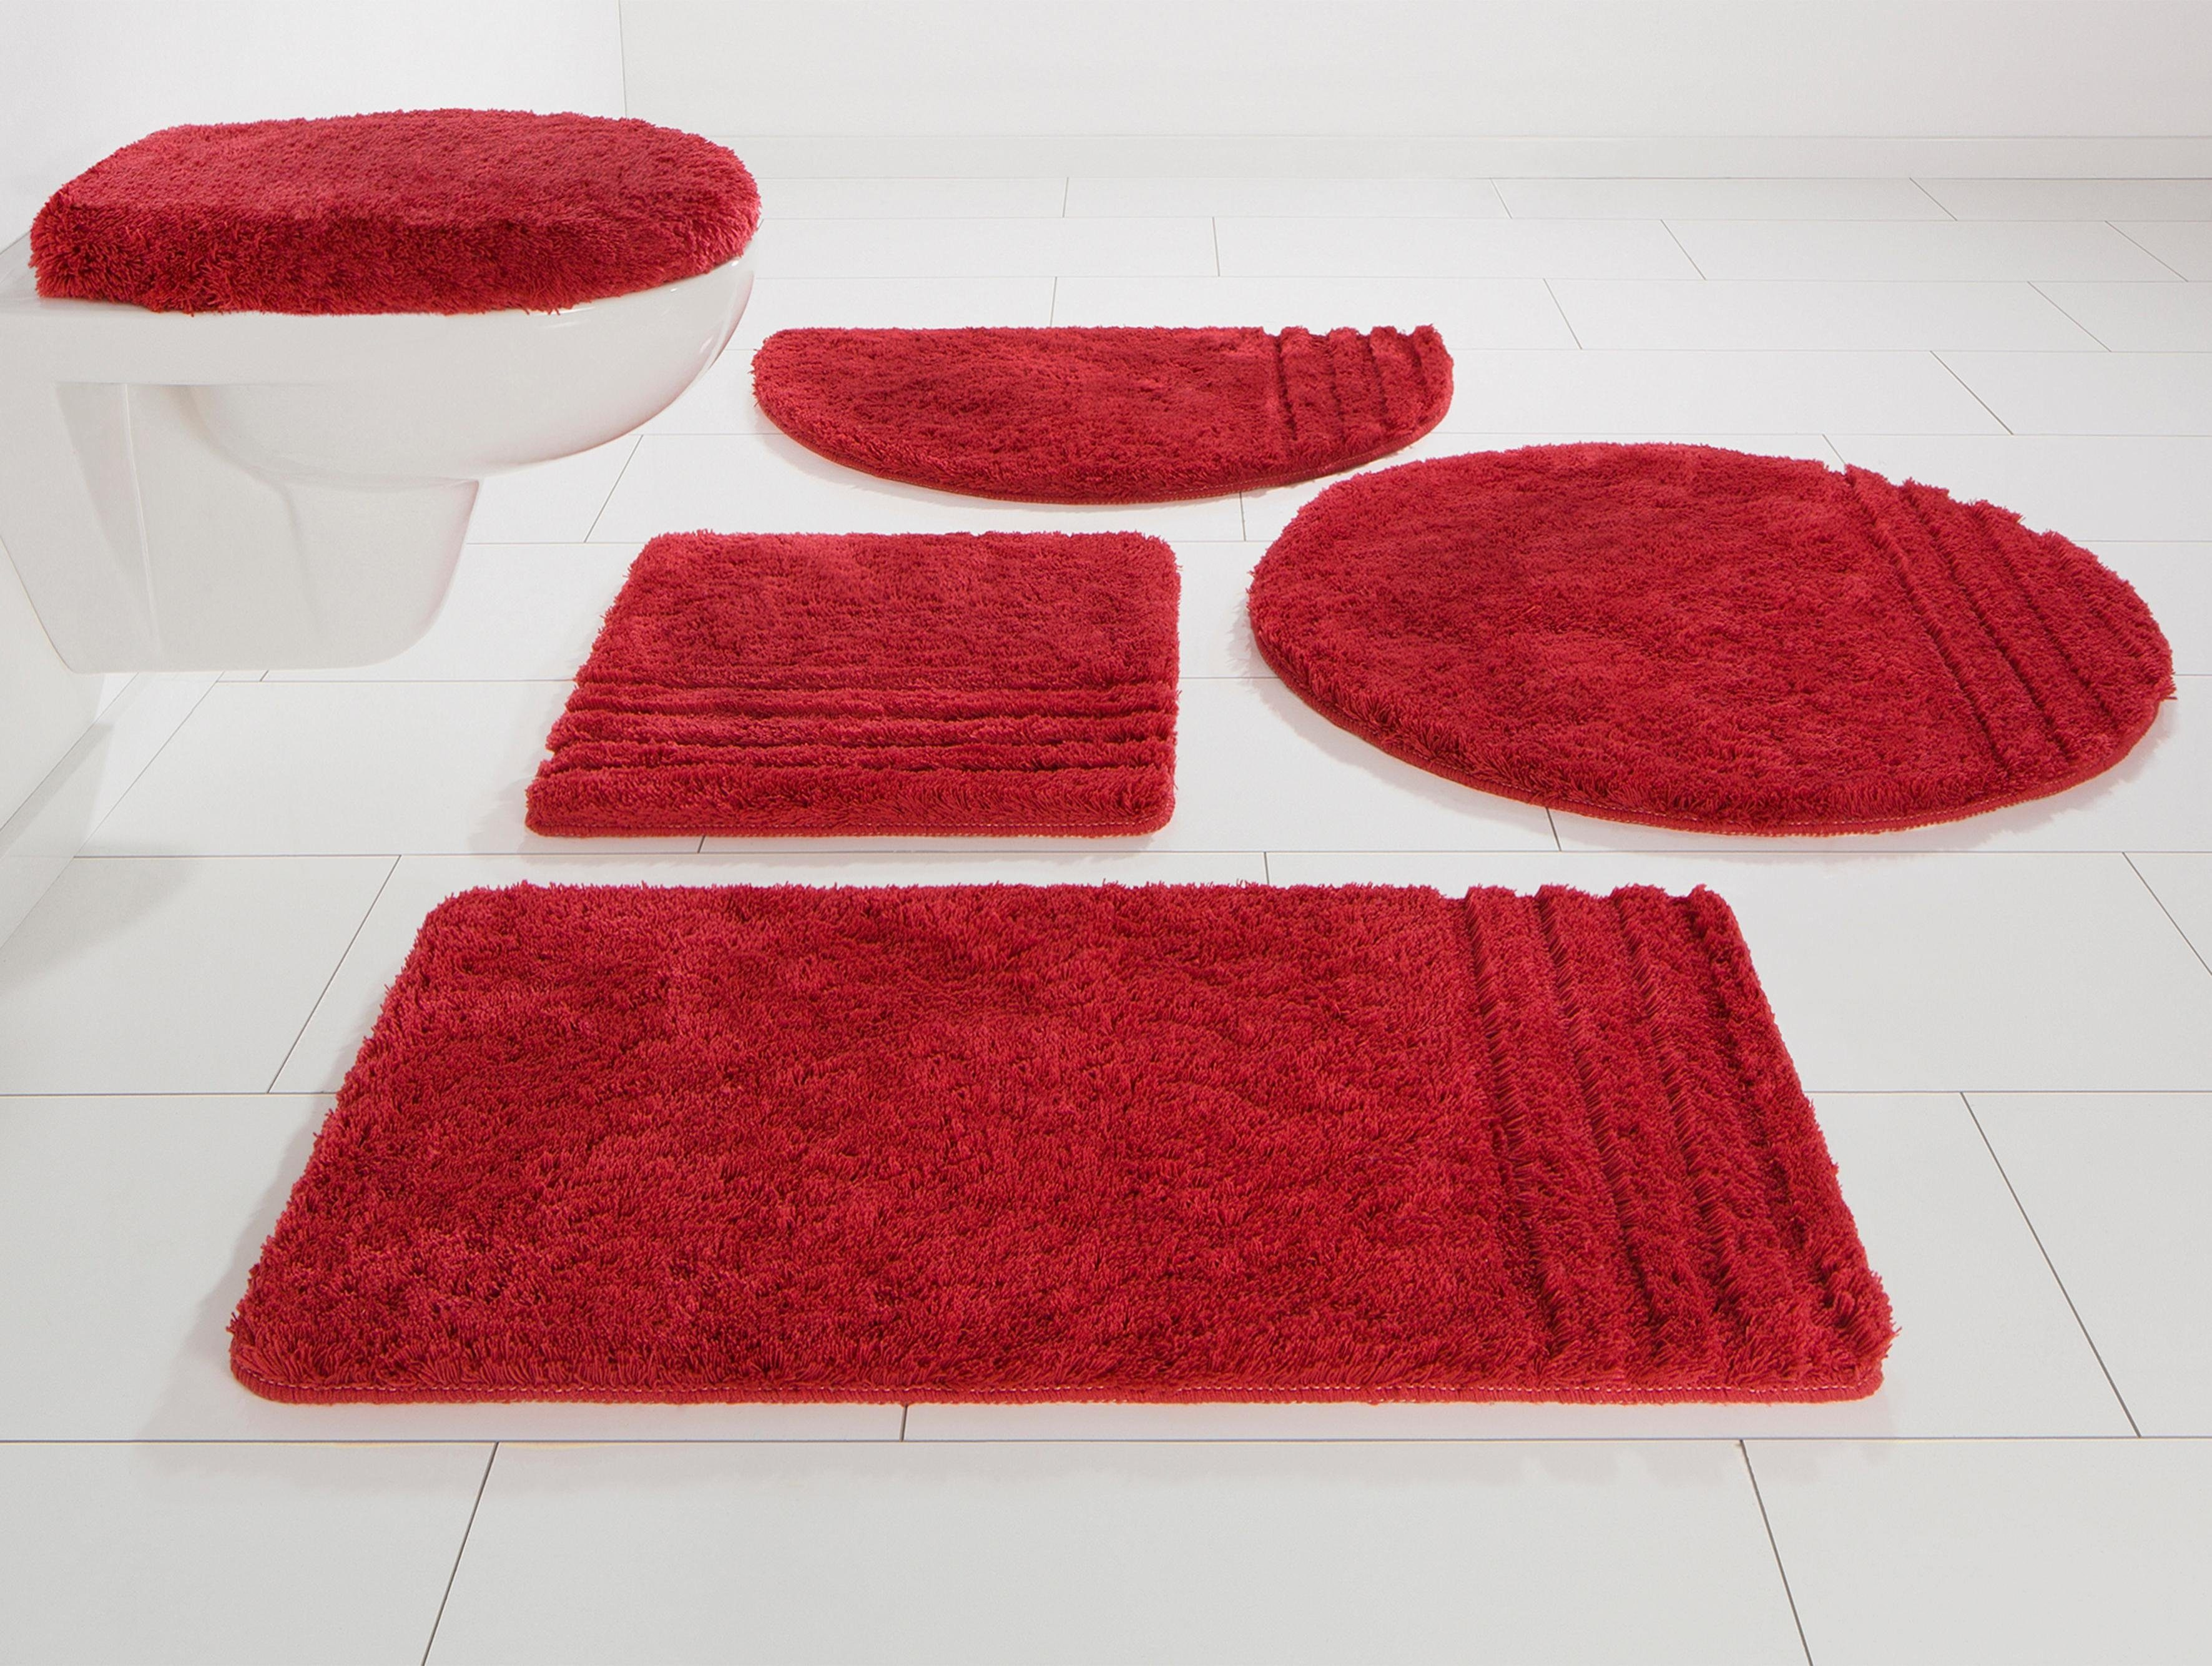 Hotelmatte Duschvorleger 60 x 80 rosa Frottee Baumwolle Kachel Muster